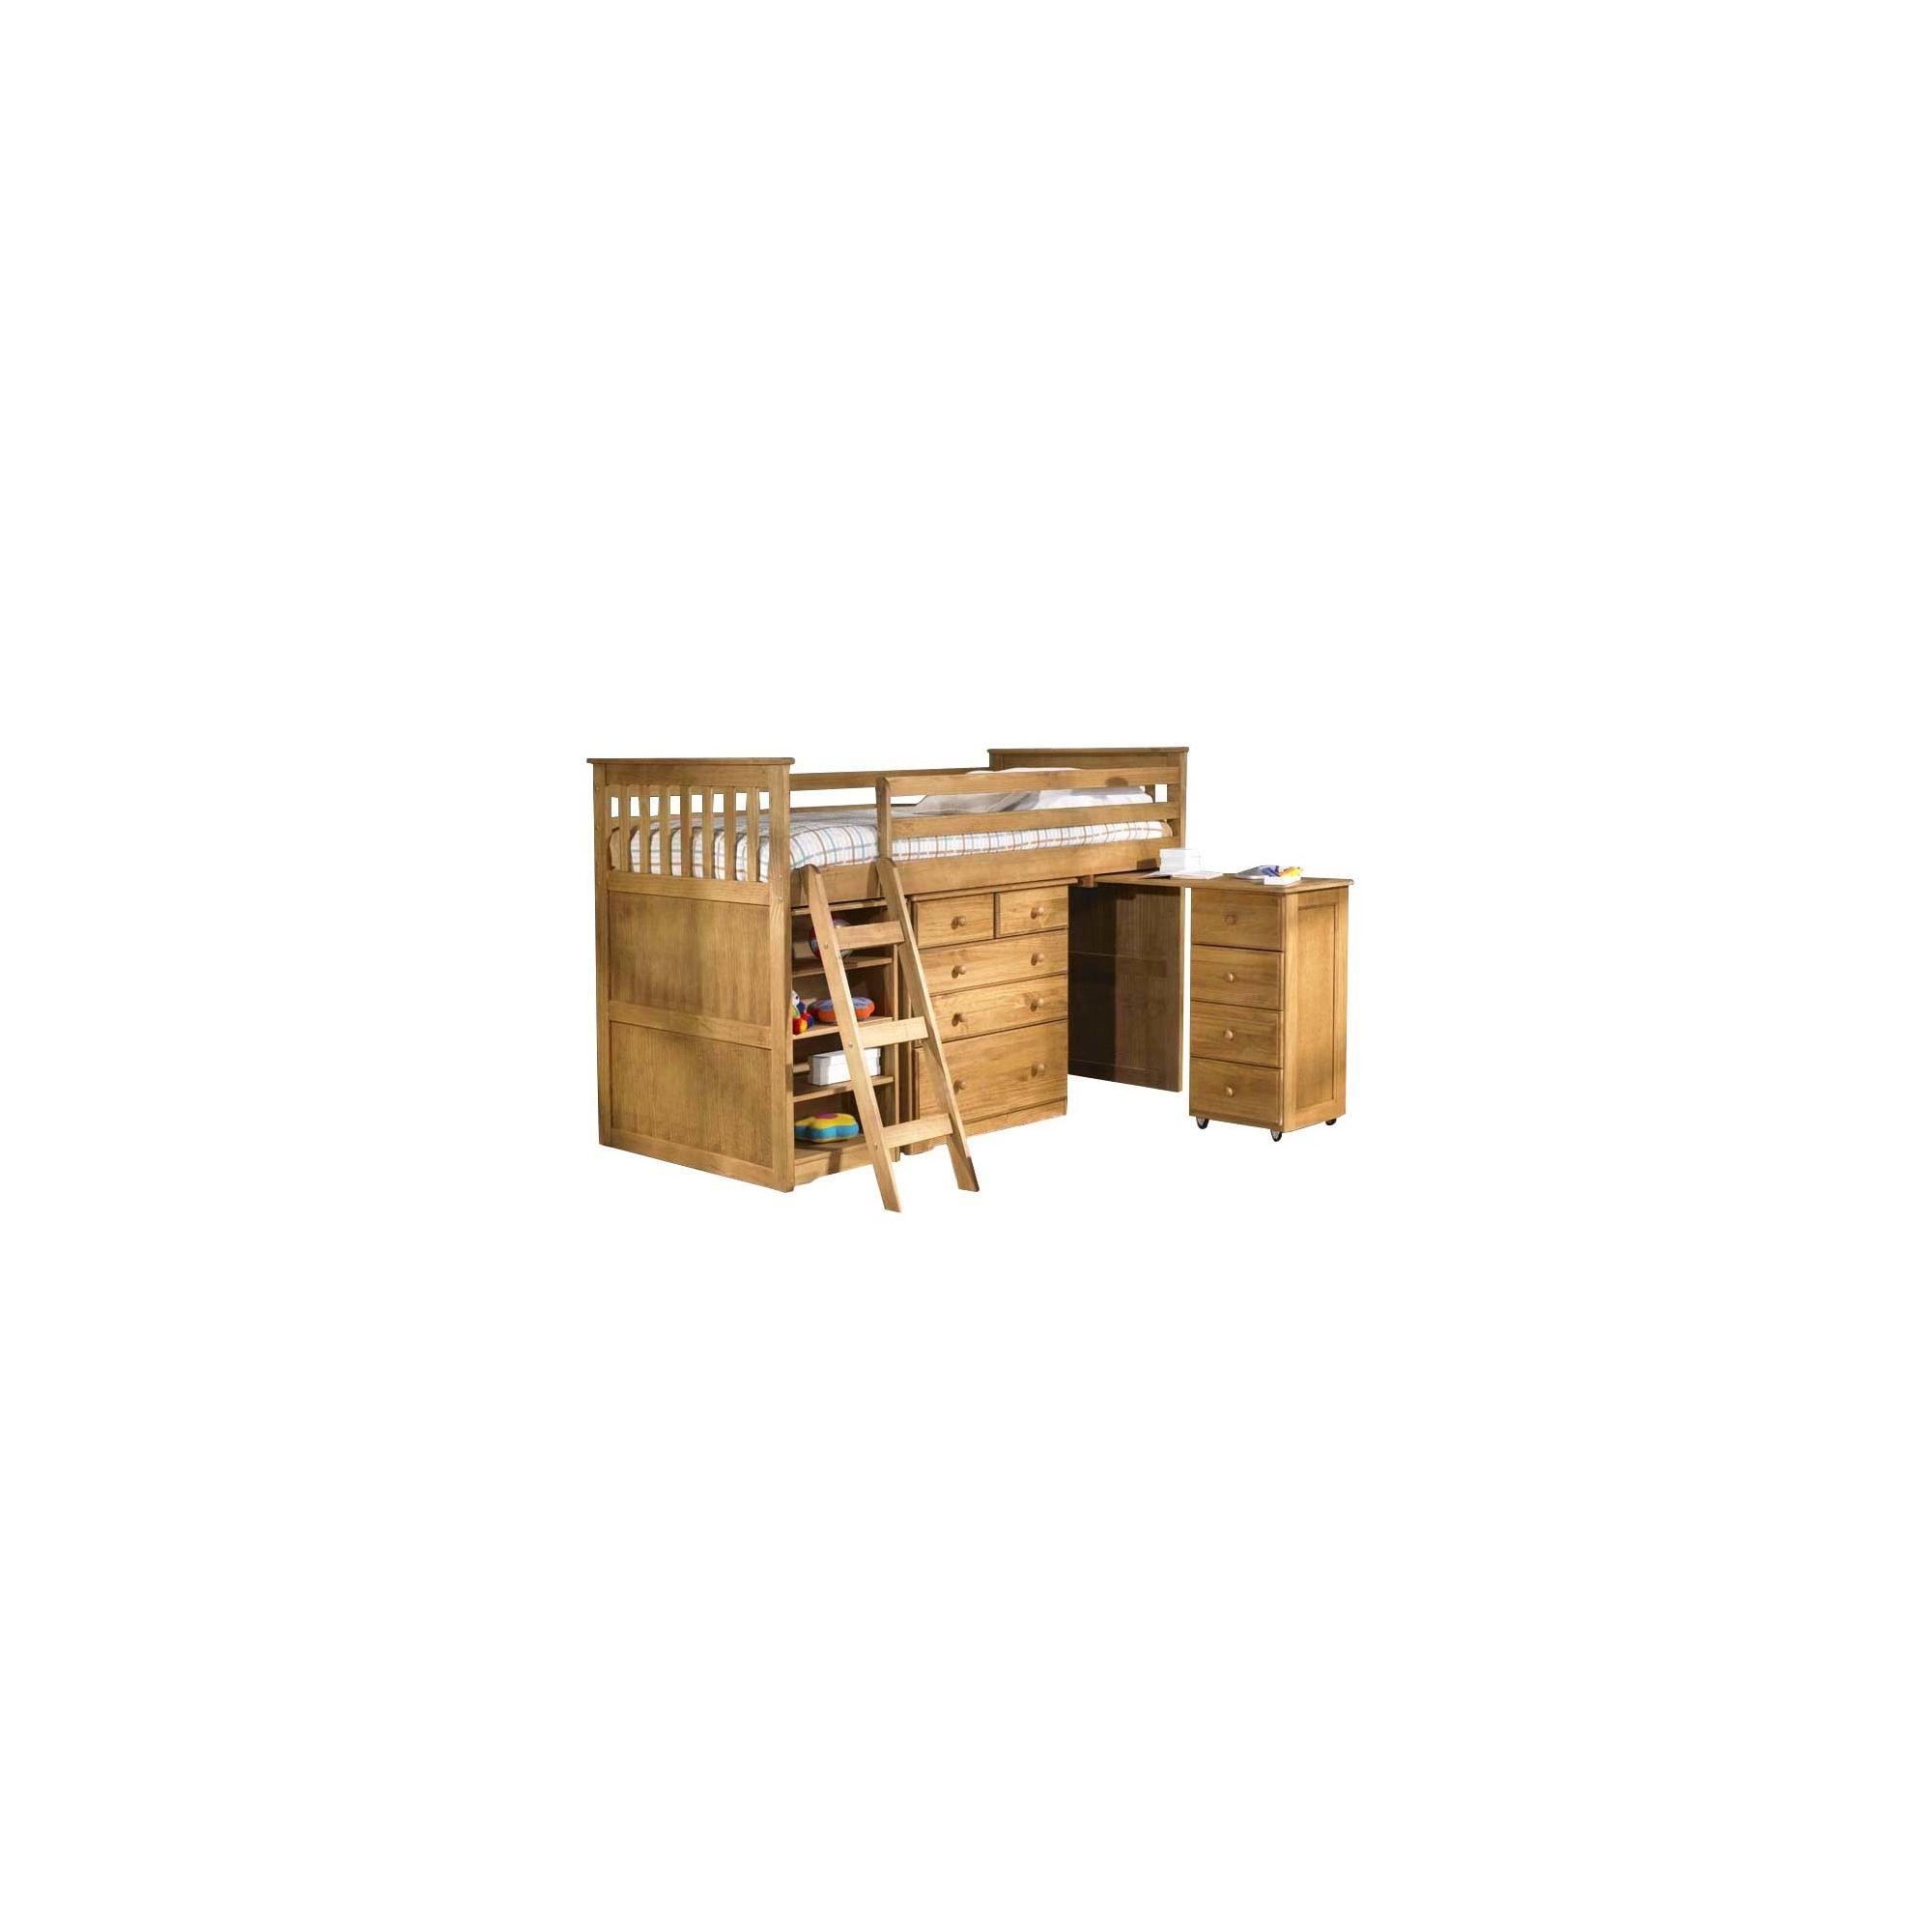 Amani Mid Sleeper Cabin Bed - Waxed Pine at Tesco Direct